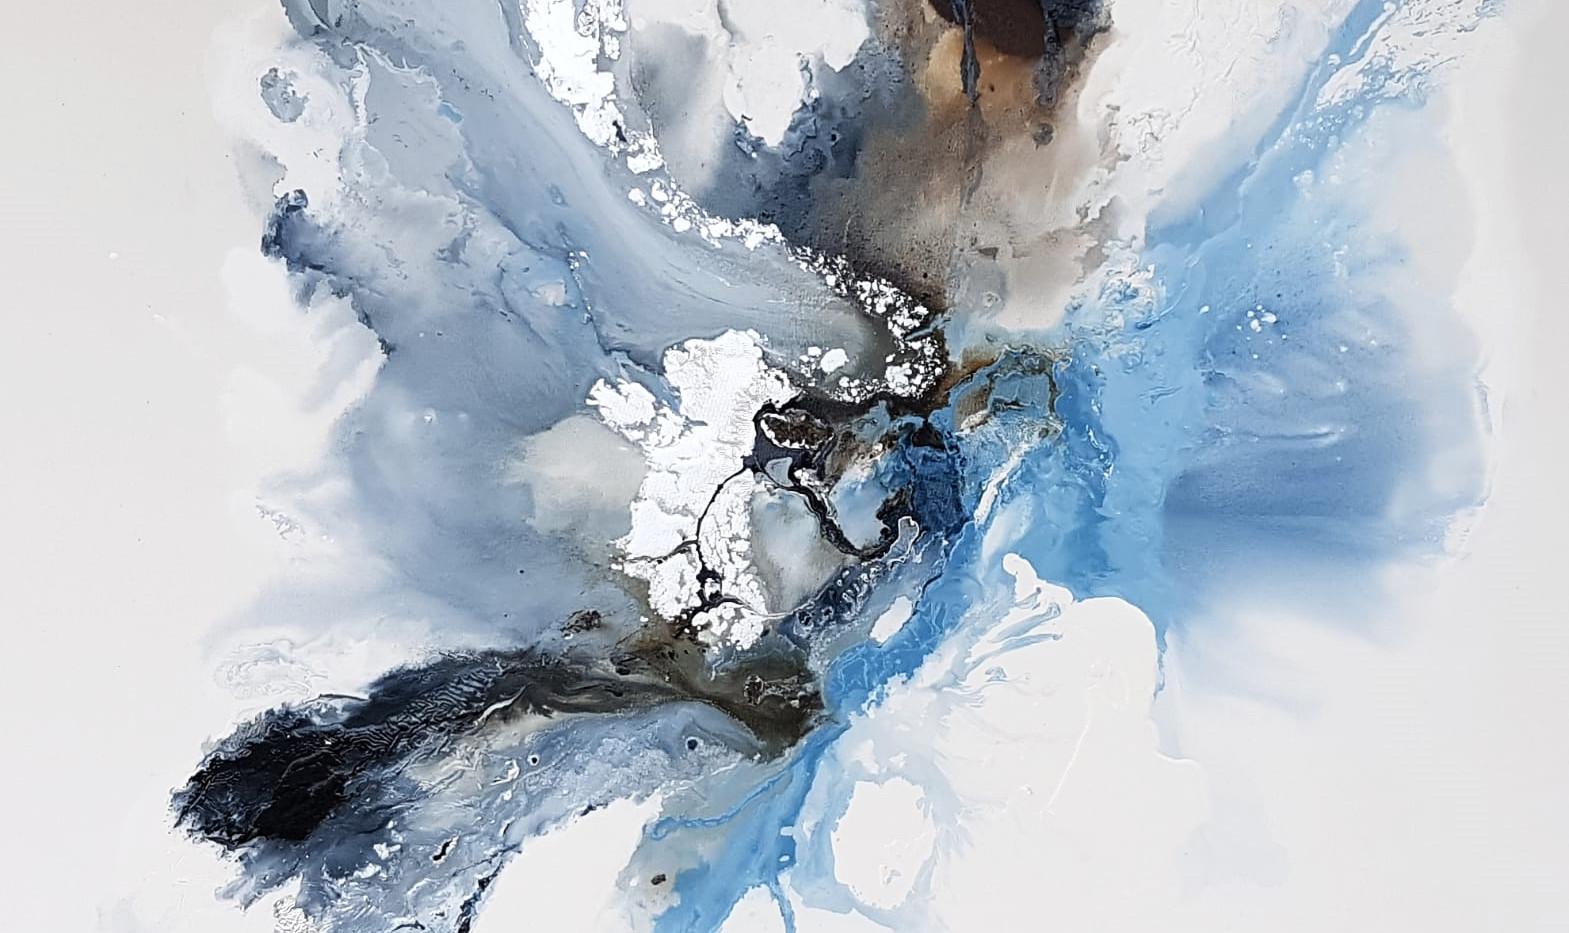 Ice Turbulance 1.3 x 1.3 m